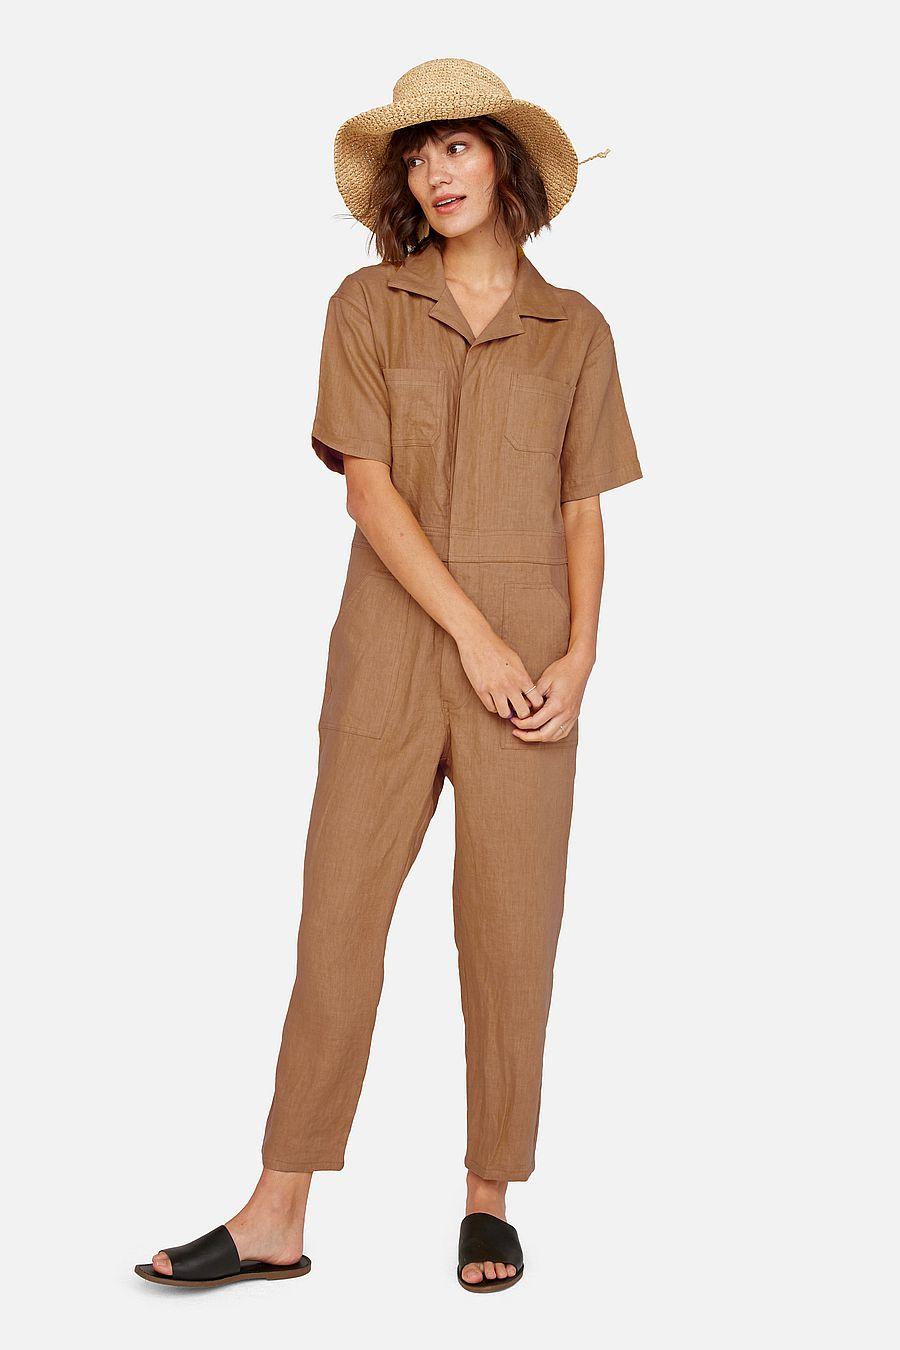 MATE The Label Linen Short Sleeve Jumpsuit - SEDONA